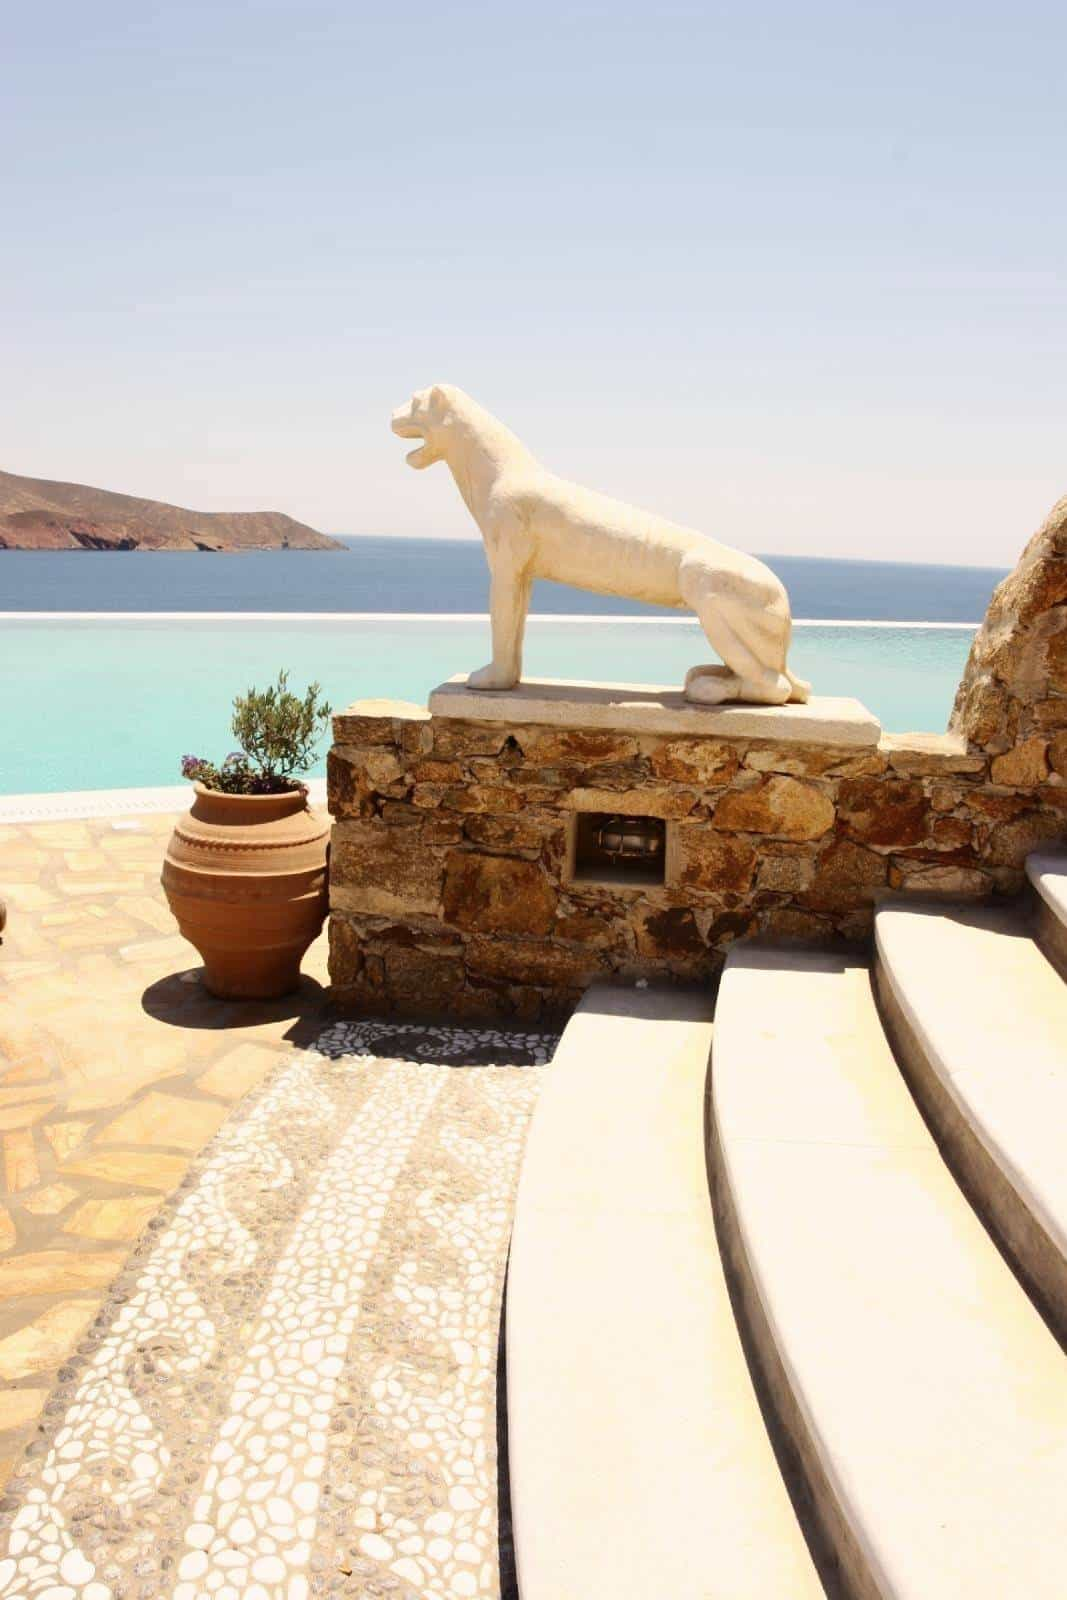 luxurious villa Mykonos - πολυτελής βίλα Μύκονος - mykonos services - οικοδομικές εργασίες 18